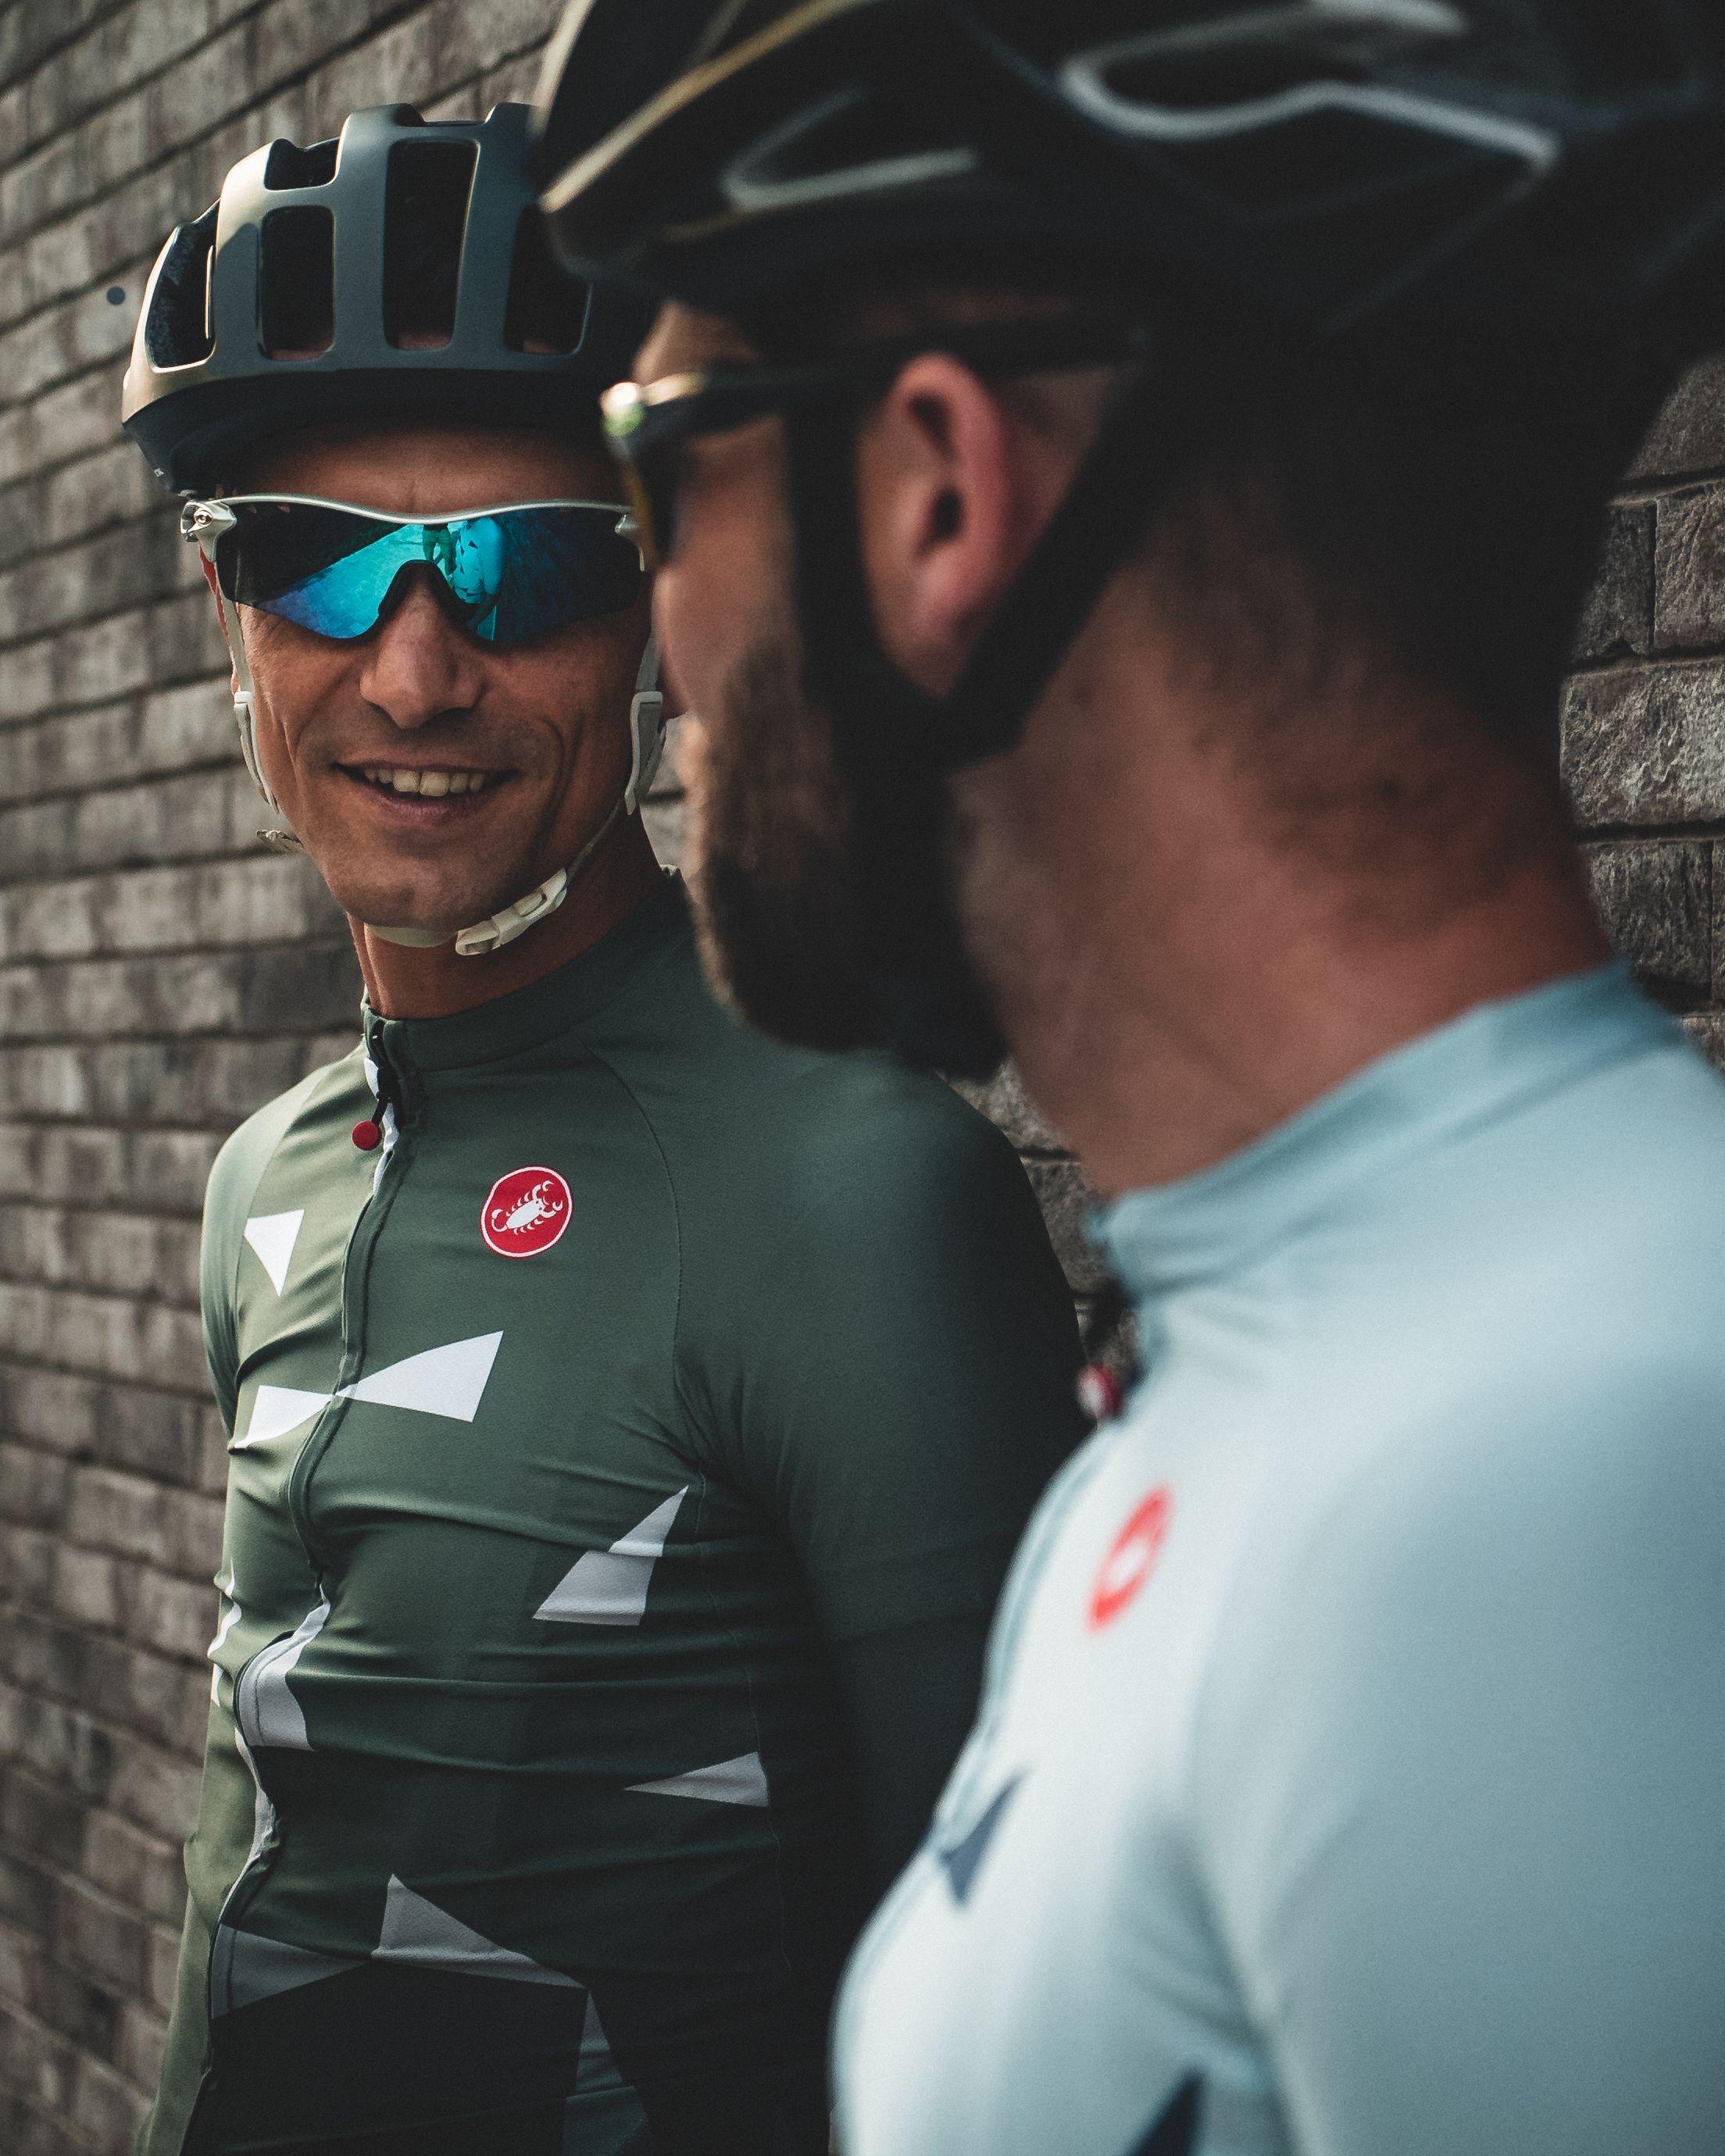 Castelli Sfocato fietsshirt Beperkte Editie